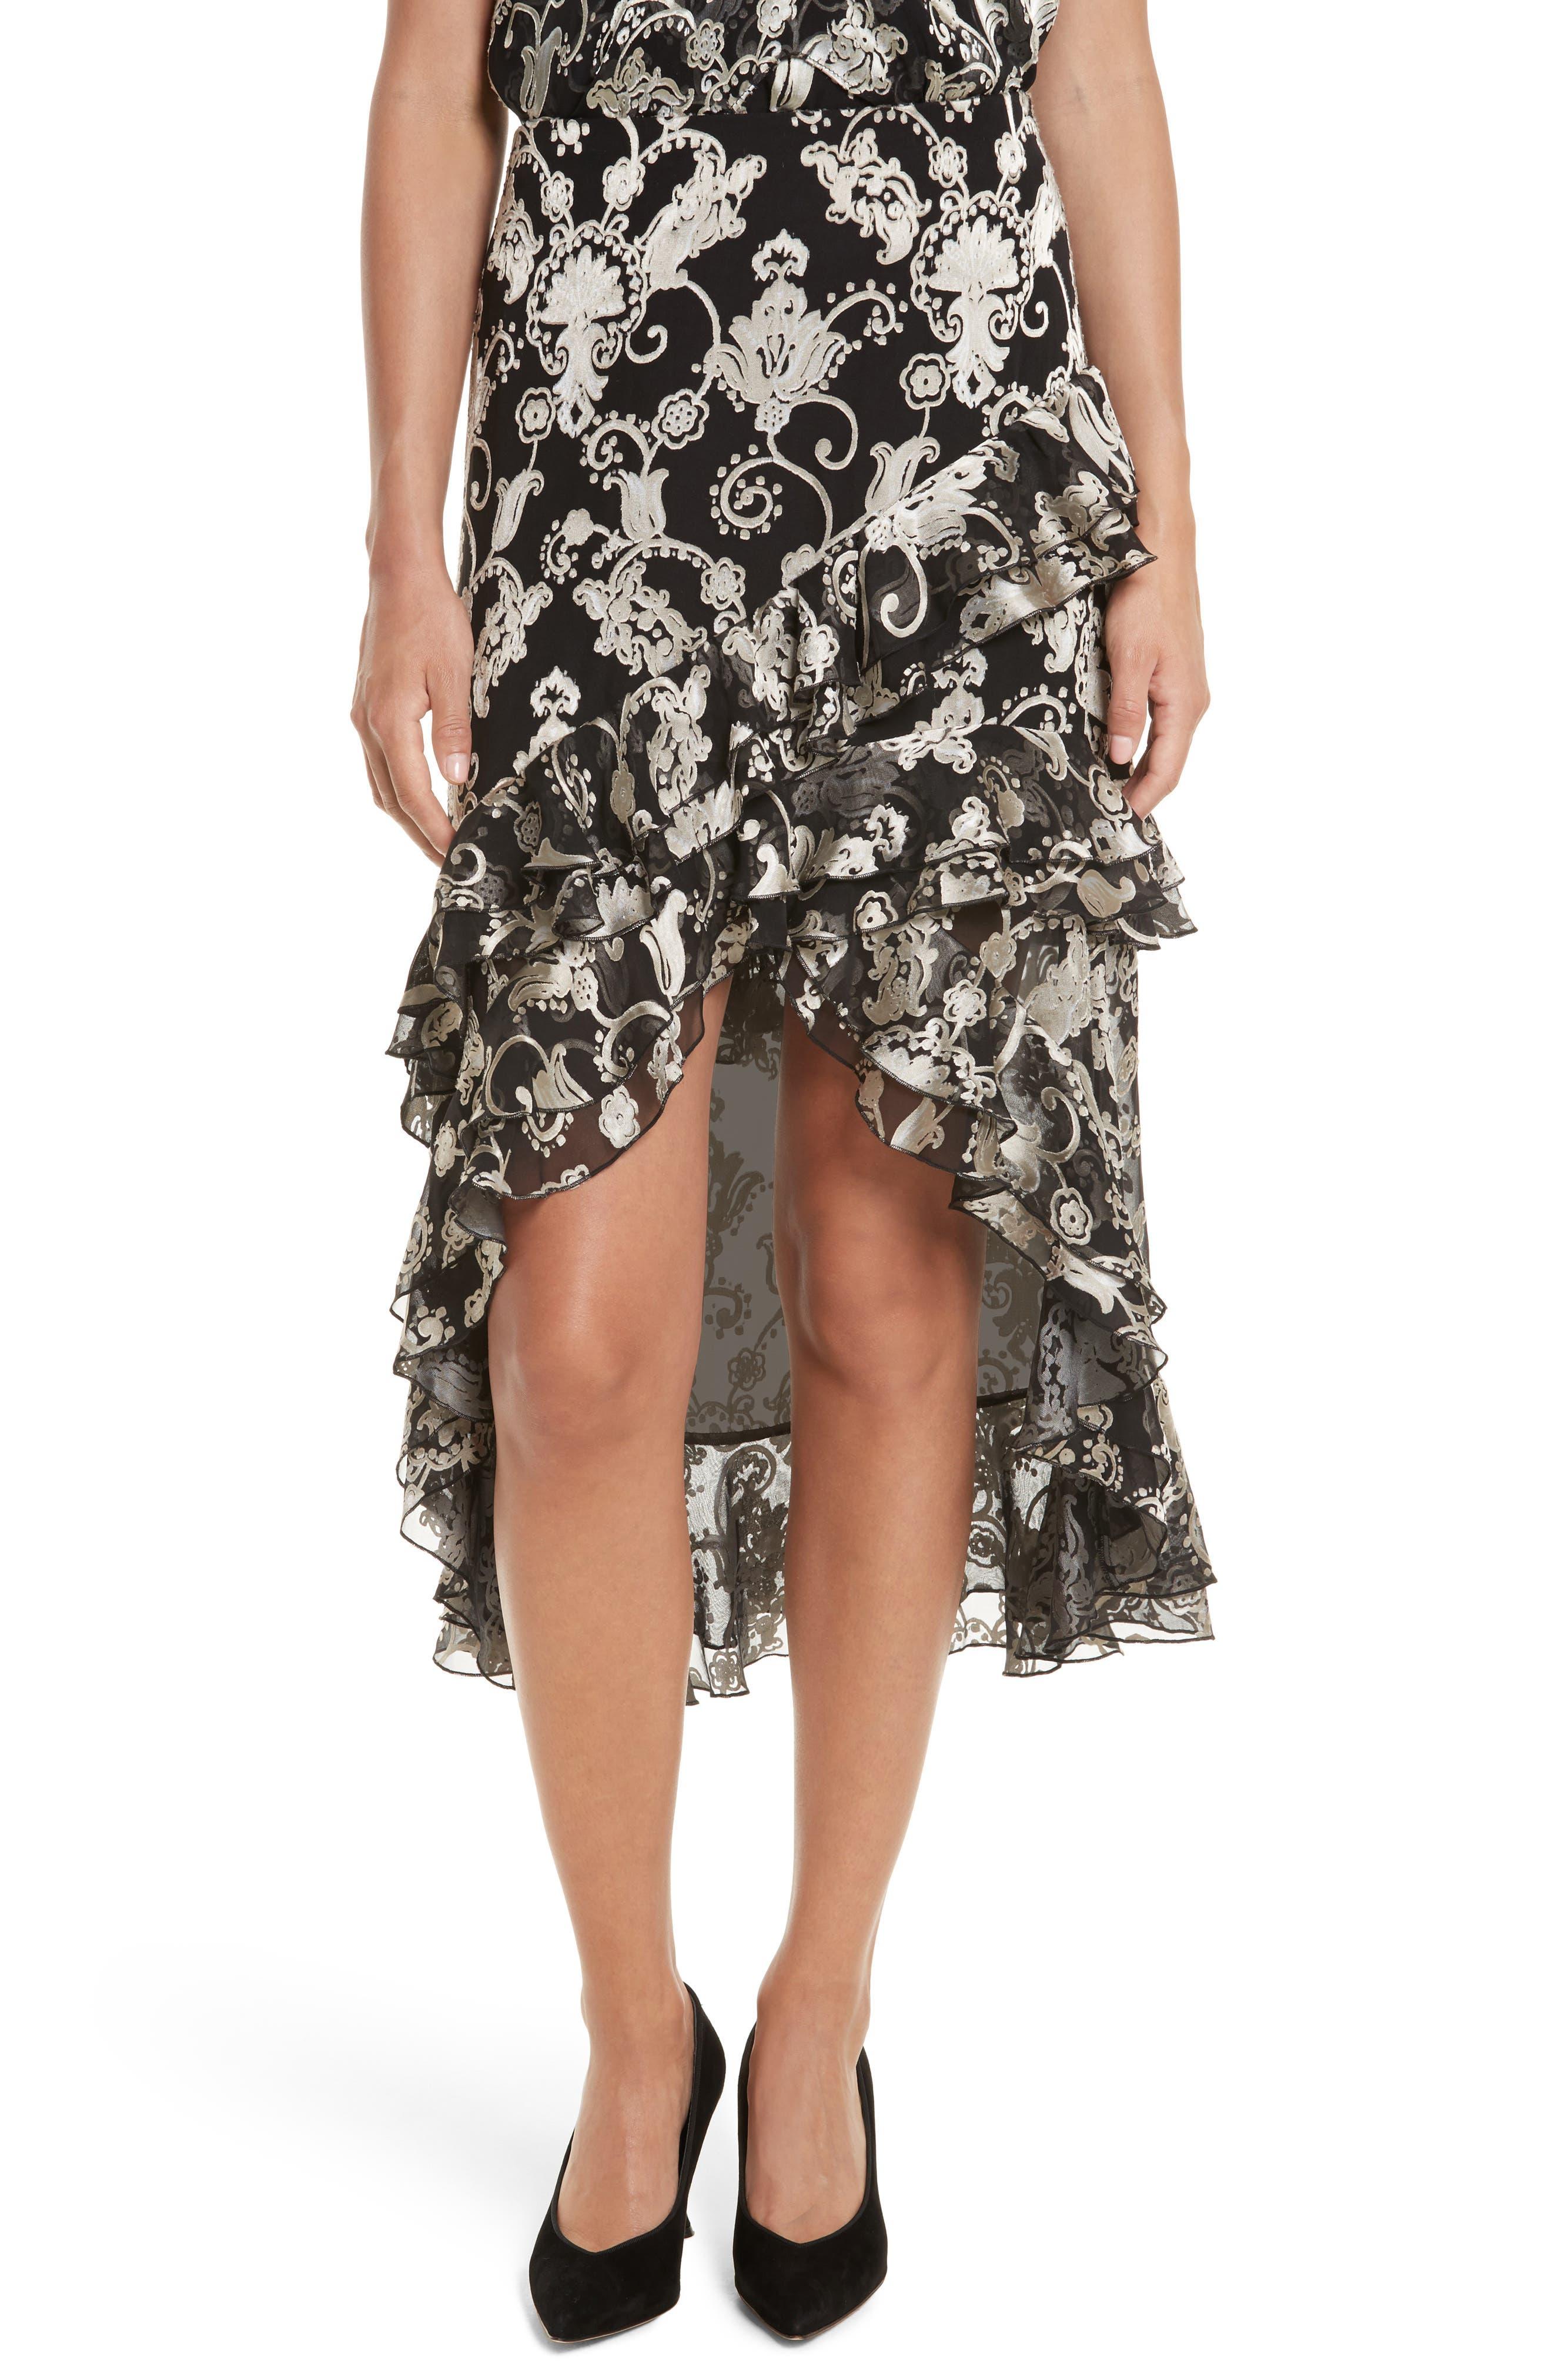 Sasha Asymmetrical Tiered Ruffle Skirt,                         Main,                         color, Black/ White